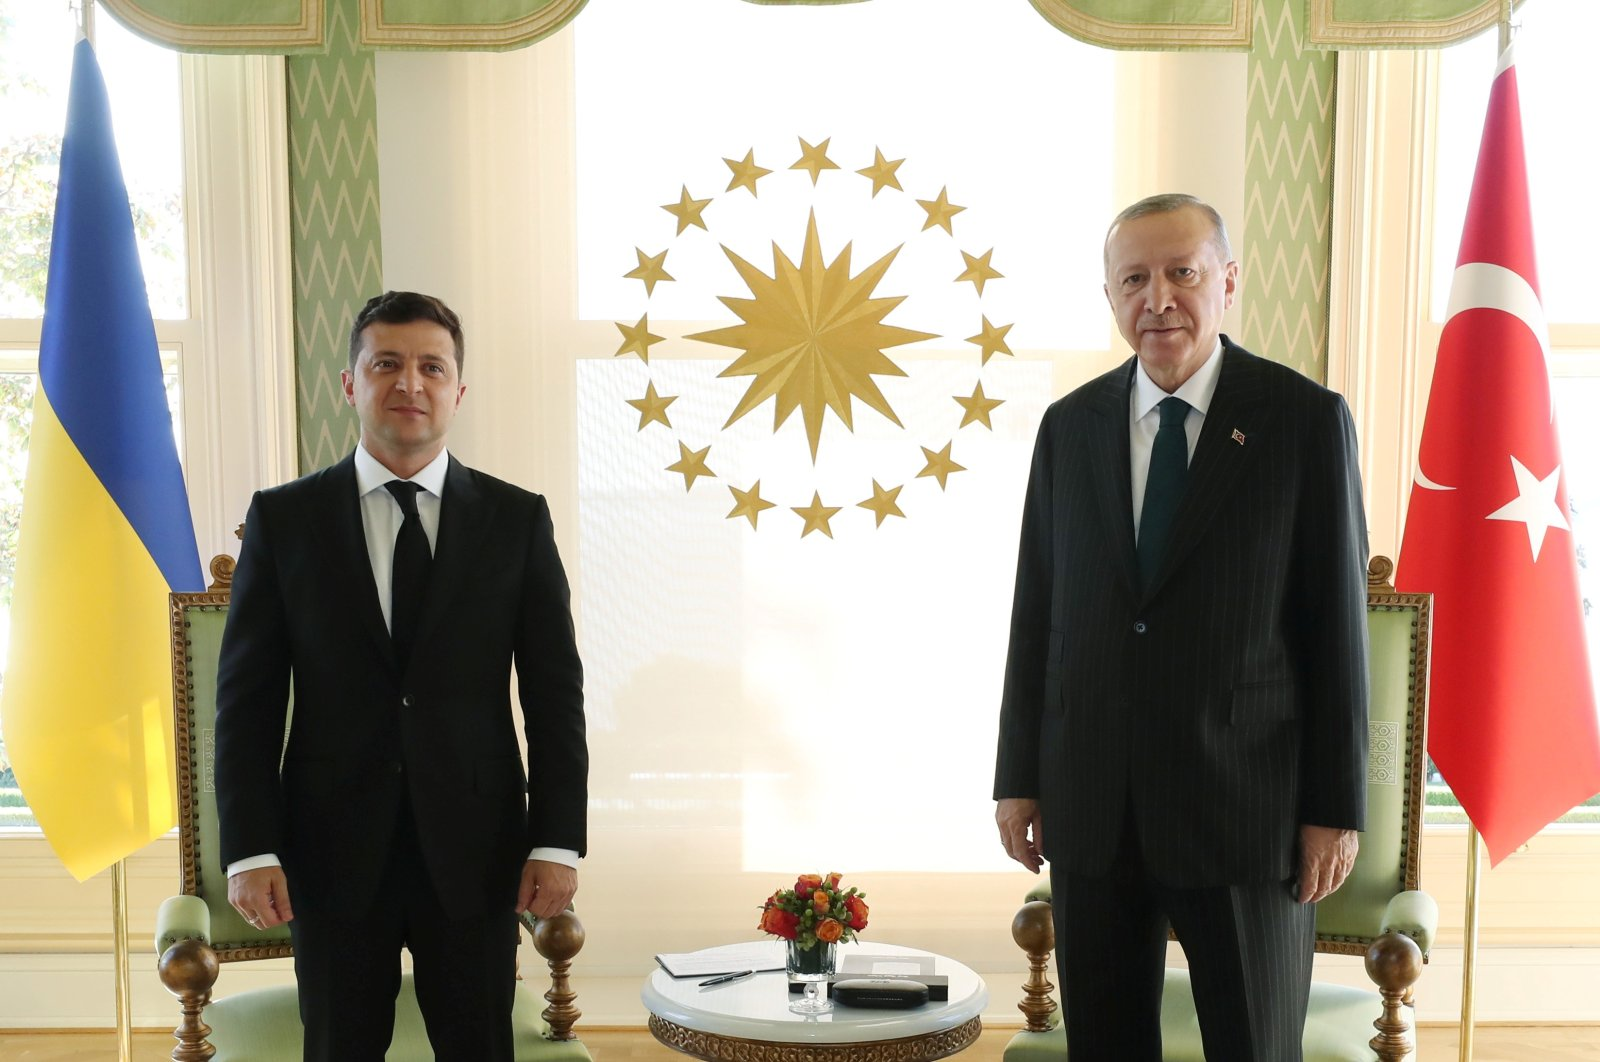 President Recep Tayyip Erdoğan meets with his Ukrainian counterpart Volodymyr Zelenskyy in Istanbul, Turkey, Oct. 16, 2020. (Reuters Photo)